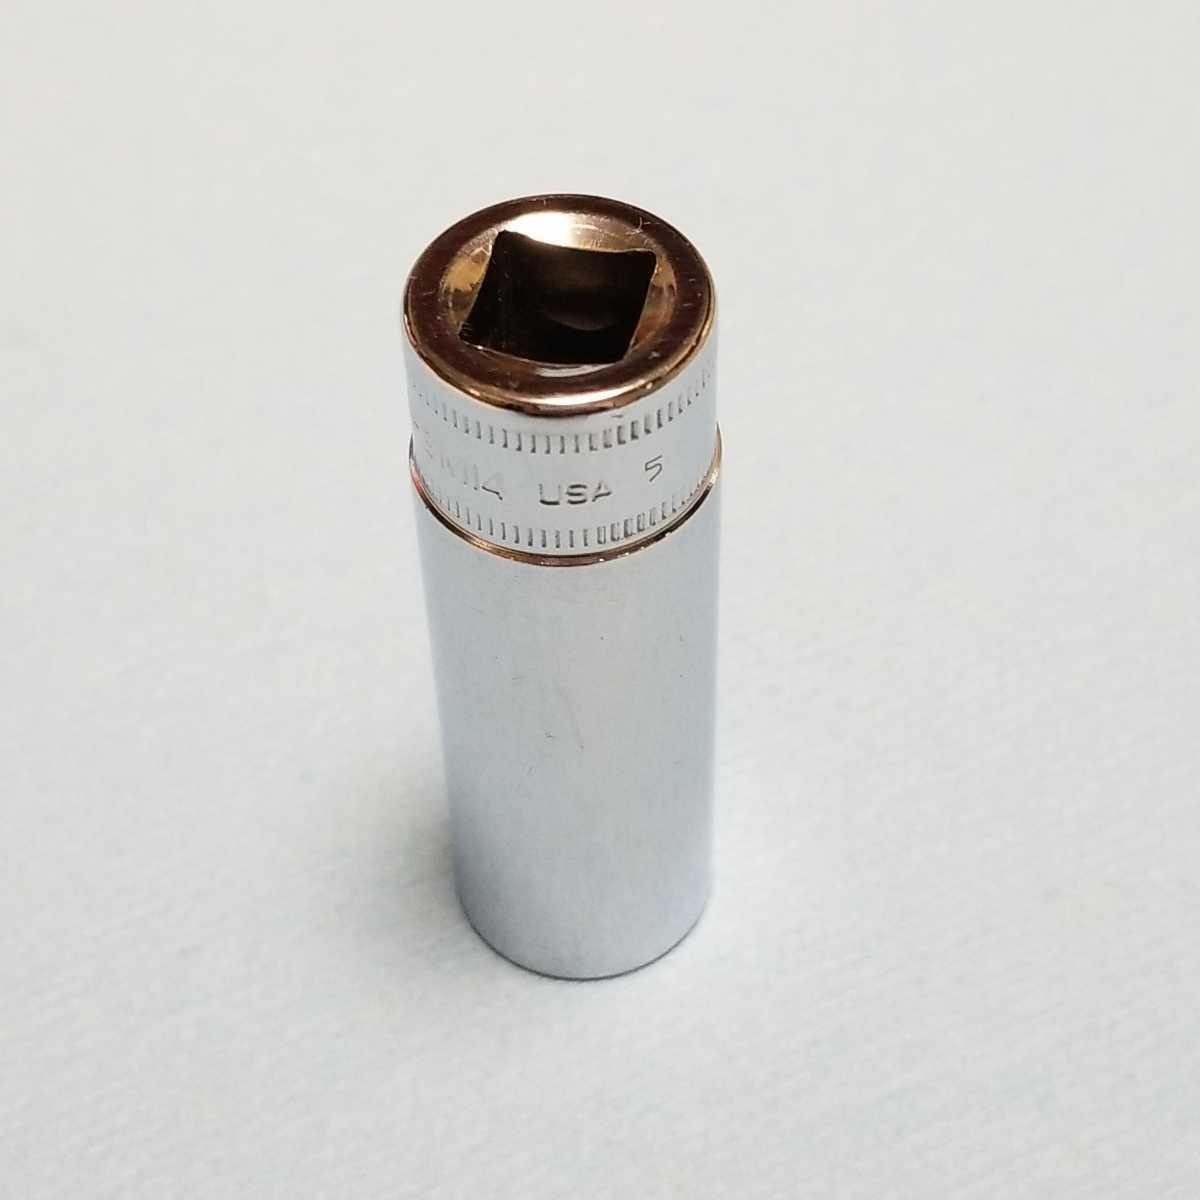 14mm 3/8 ディープ スナップオン SFSM14 (6角) 中古品 美品 保管品 SNAPON SNAP-ON ディープソケット ソケット 送料無料 Snap-on _画像2